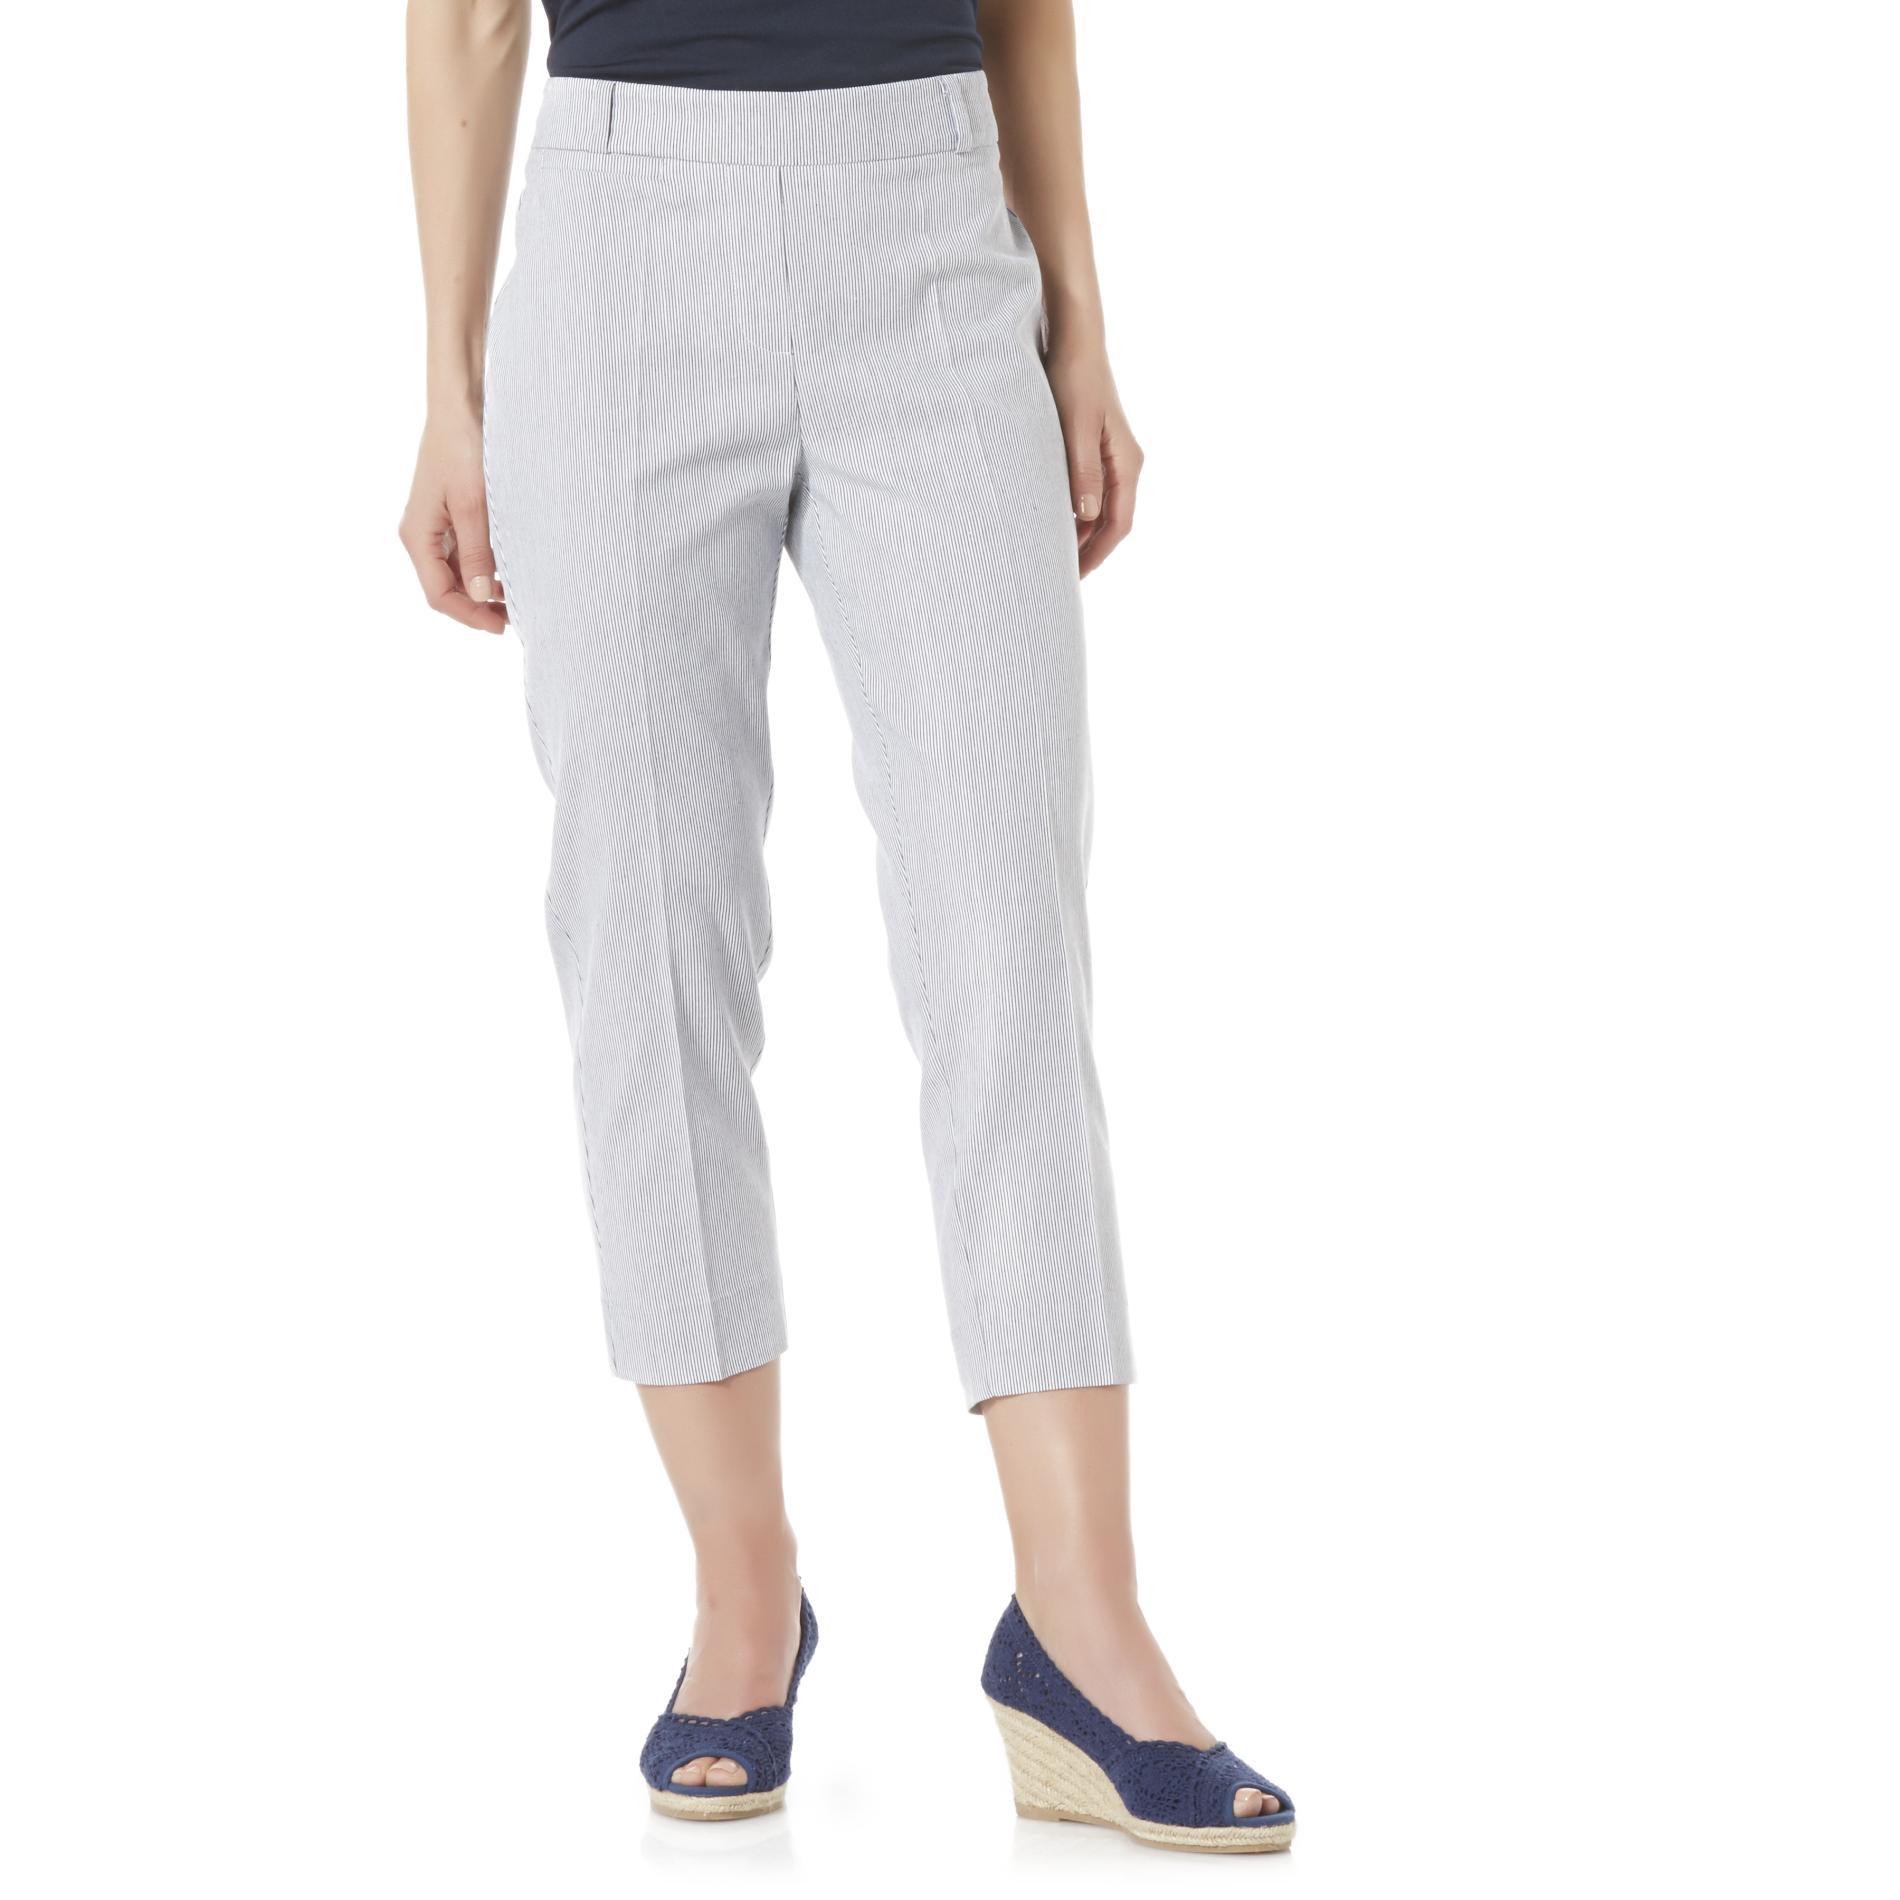 Basic Editions Women's Seersucker Capri Pants - Striped